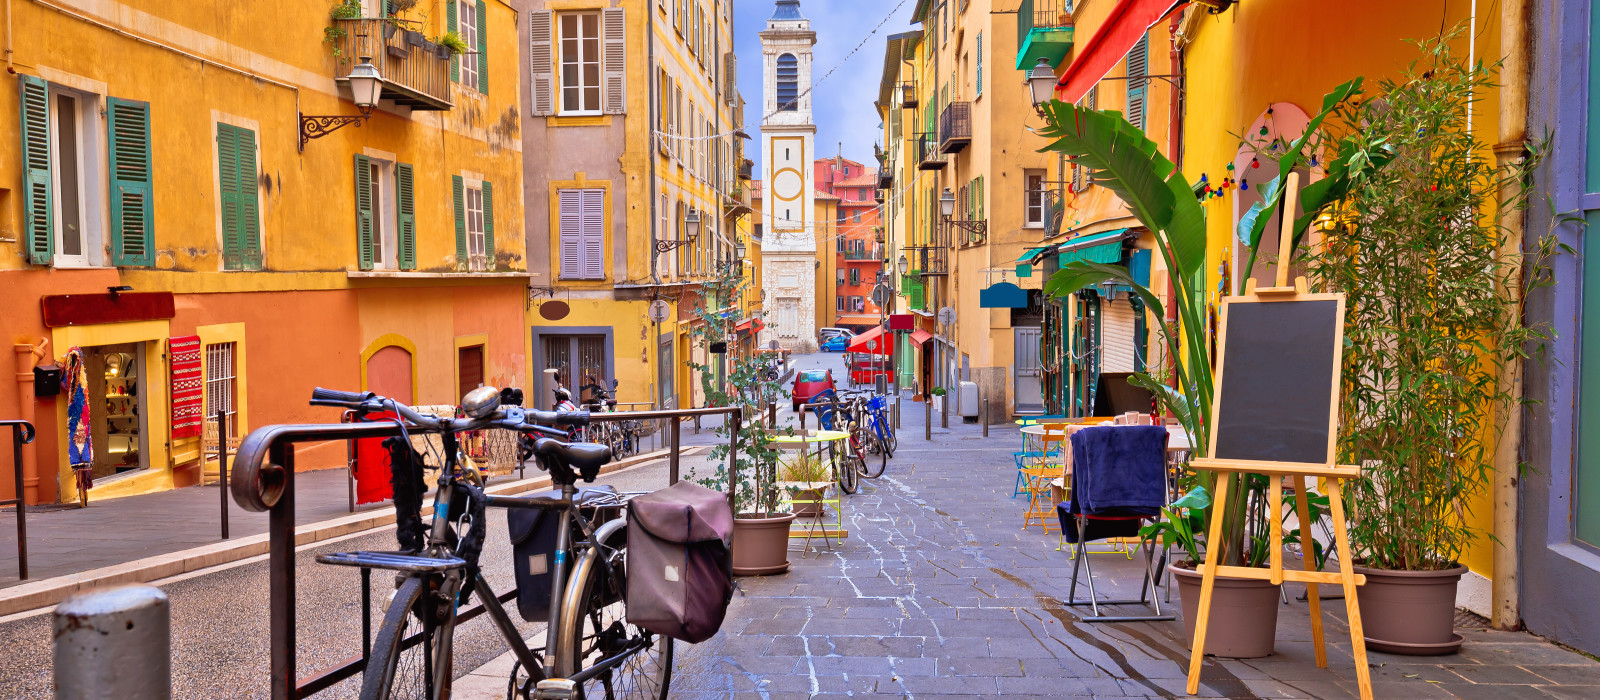 Destination Nice France